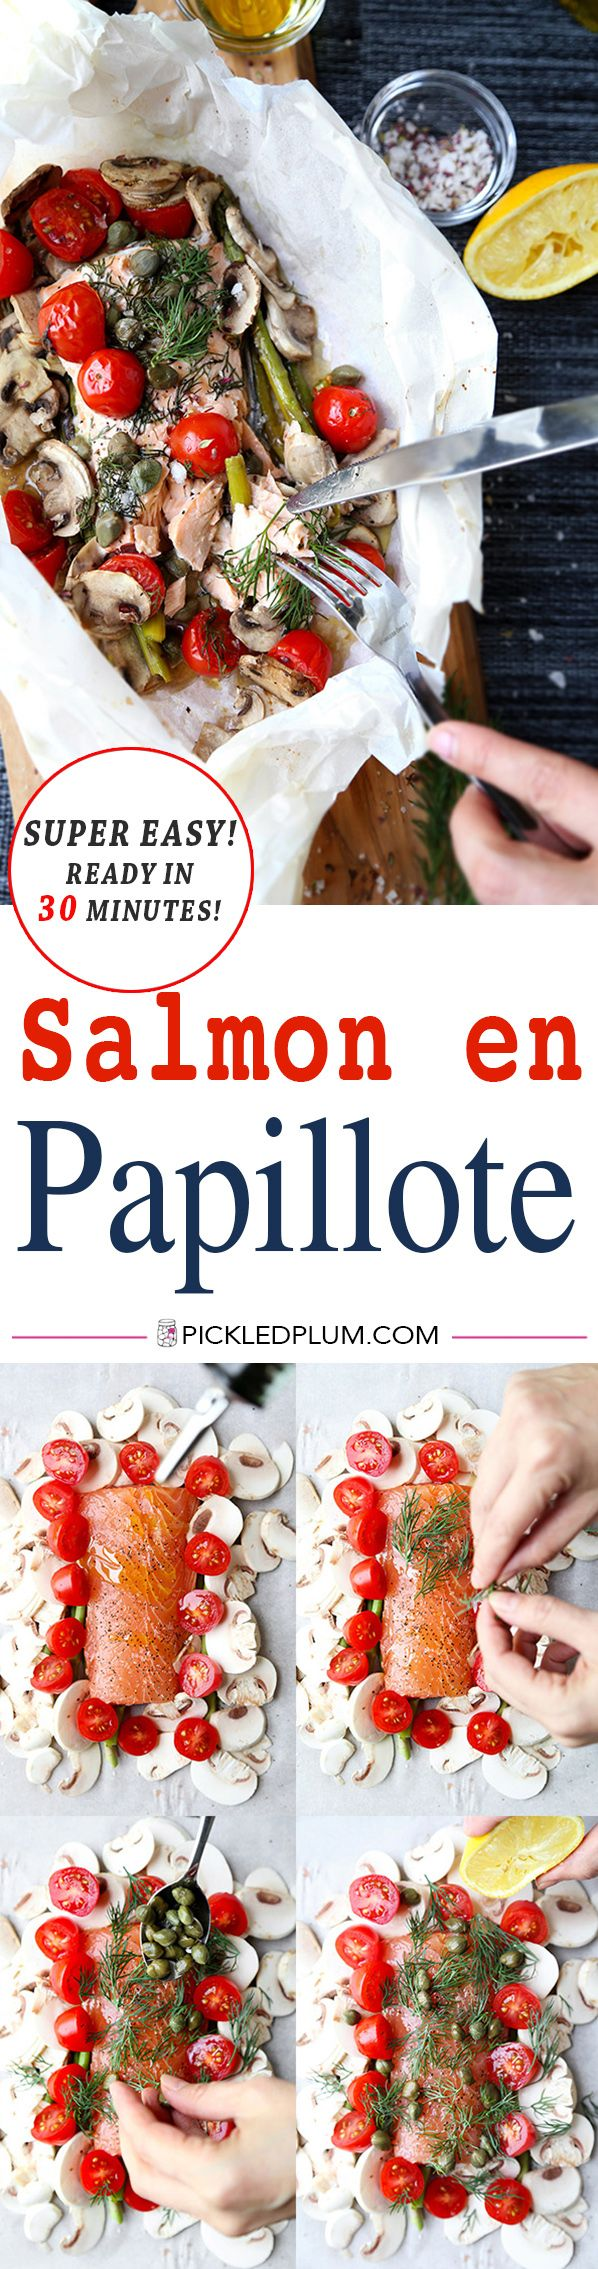 Salmon En Papillote A Tasty Healthy Easy To Make Salmon En Papillote Recipe